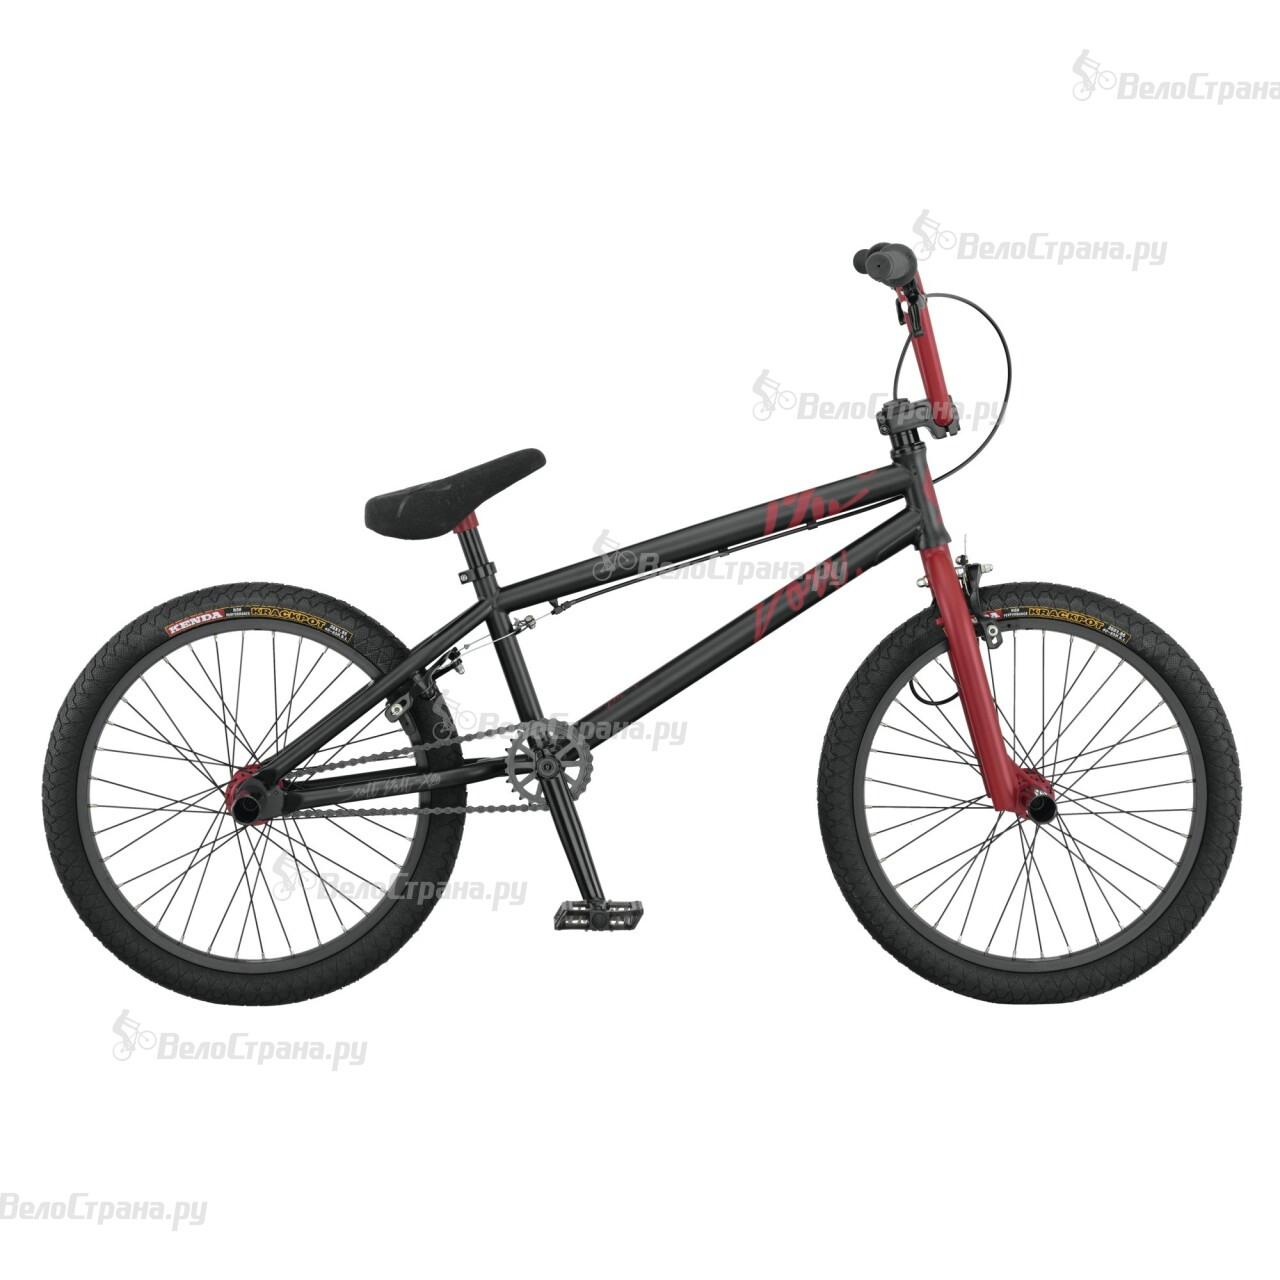 Велосипед Scott Volt-X 20 (2015)